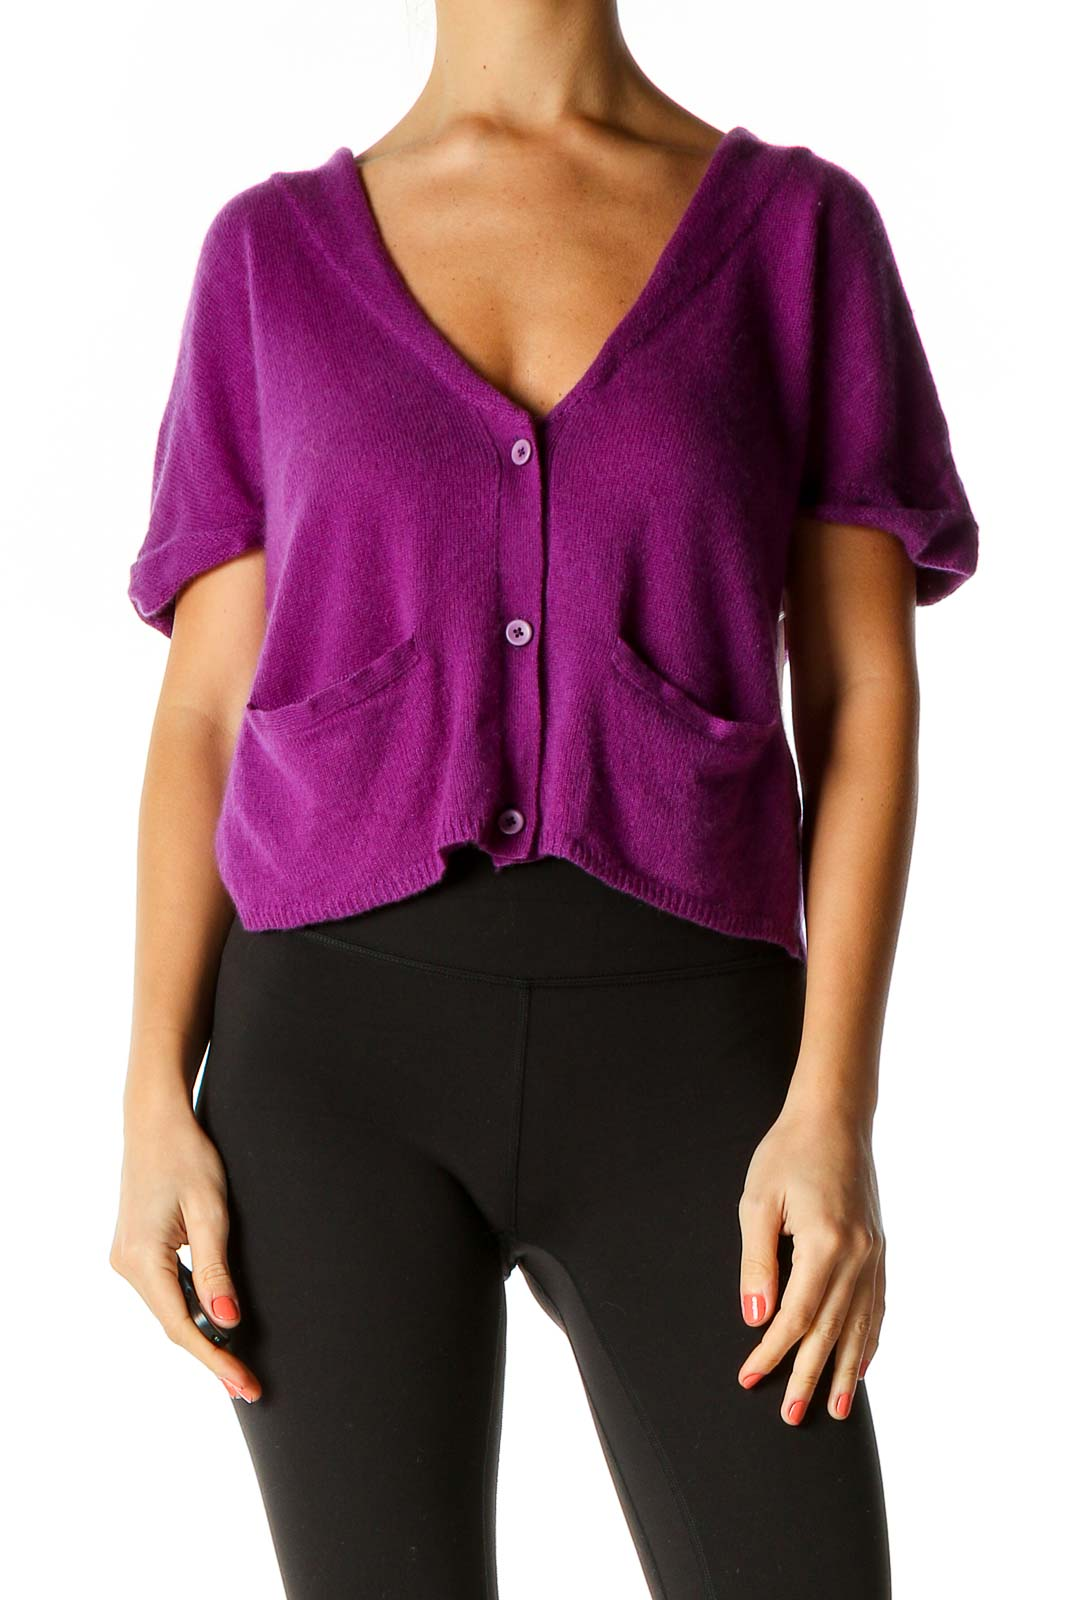 Purple Cardigan Front